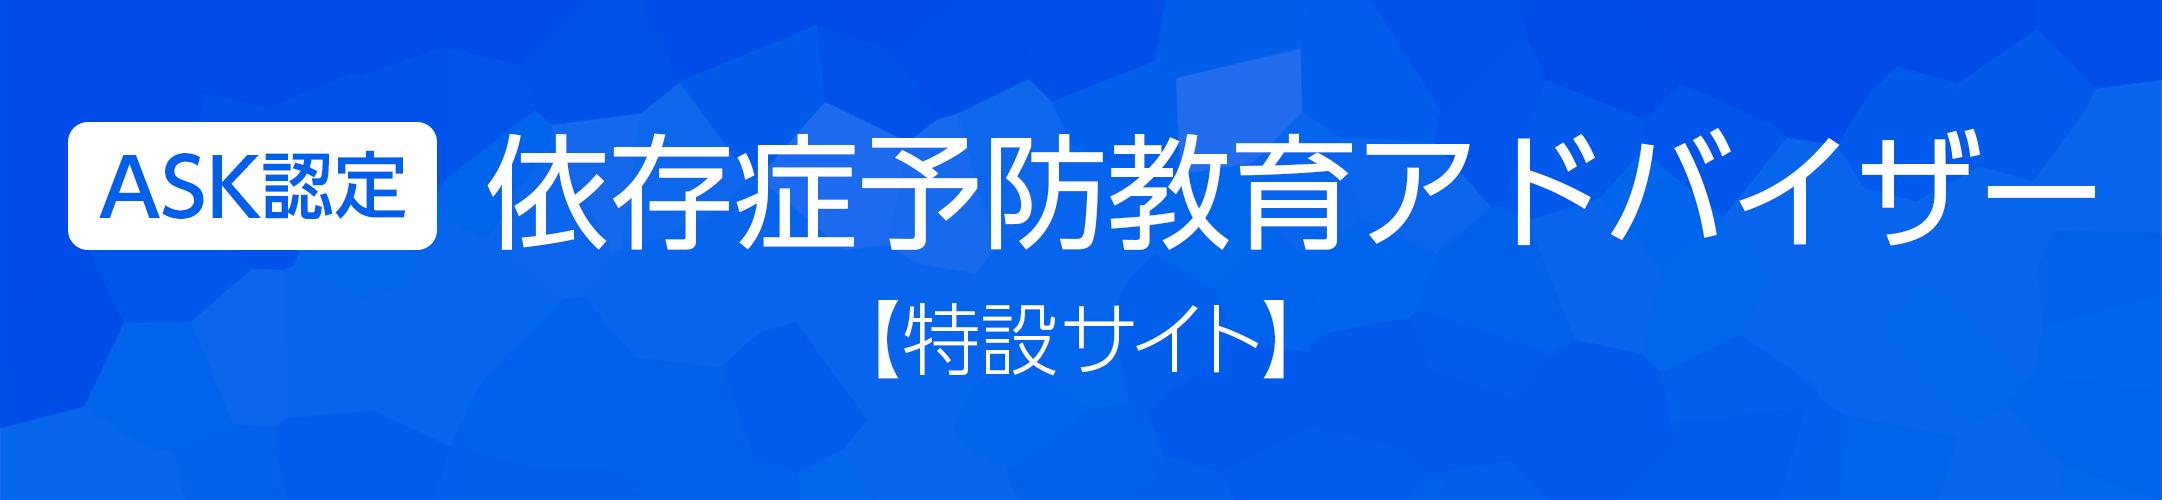 ASK認定 依存症予防教育アドバイザー【特設サイト】